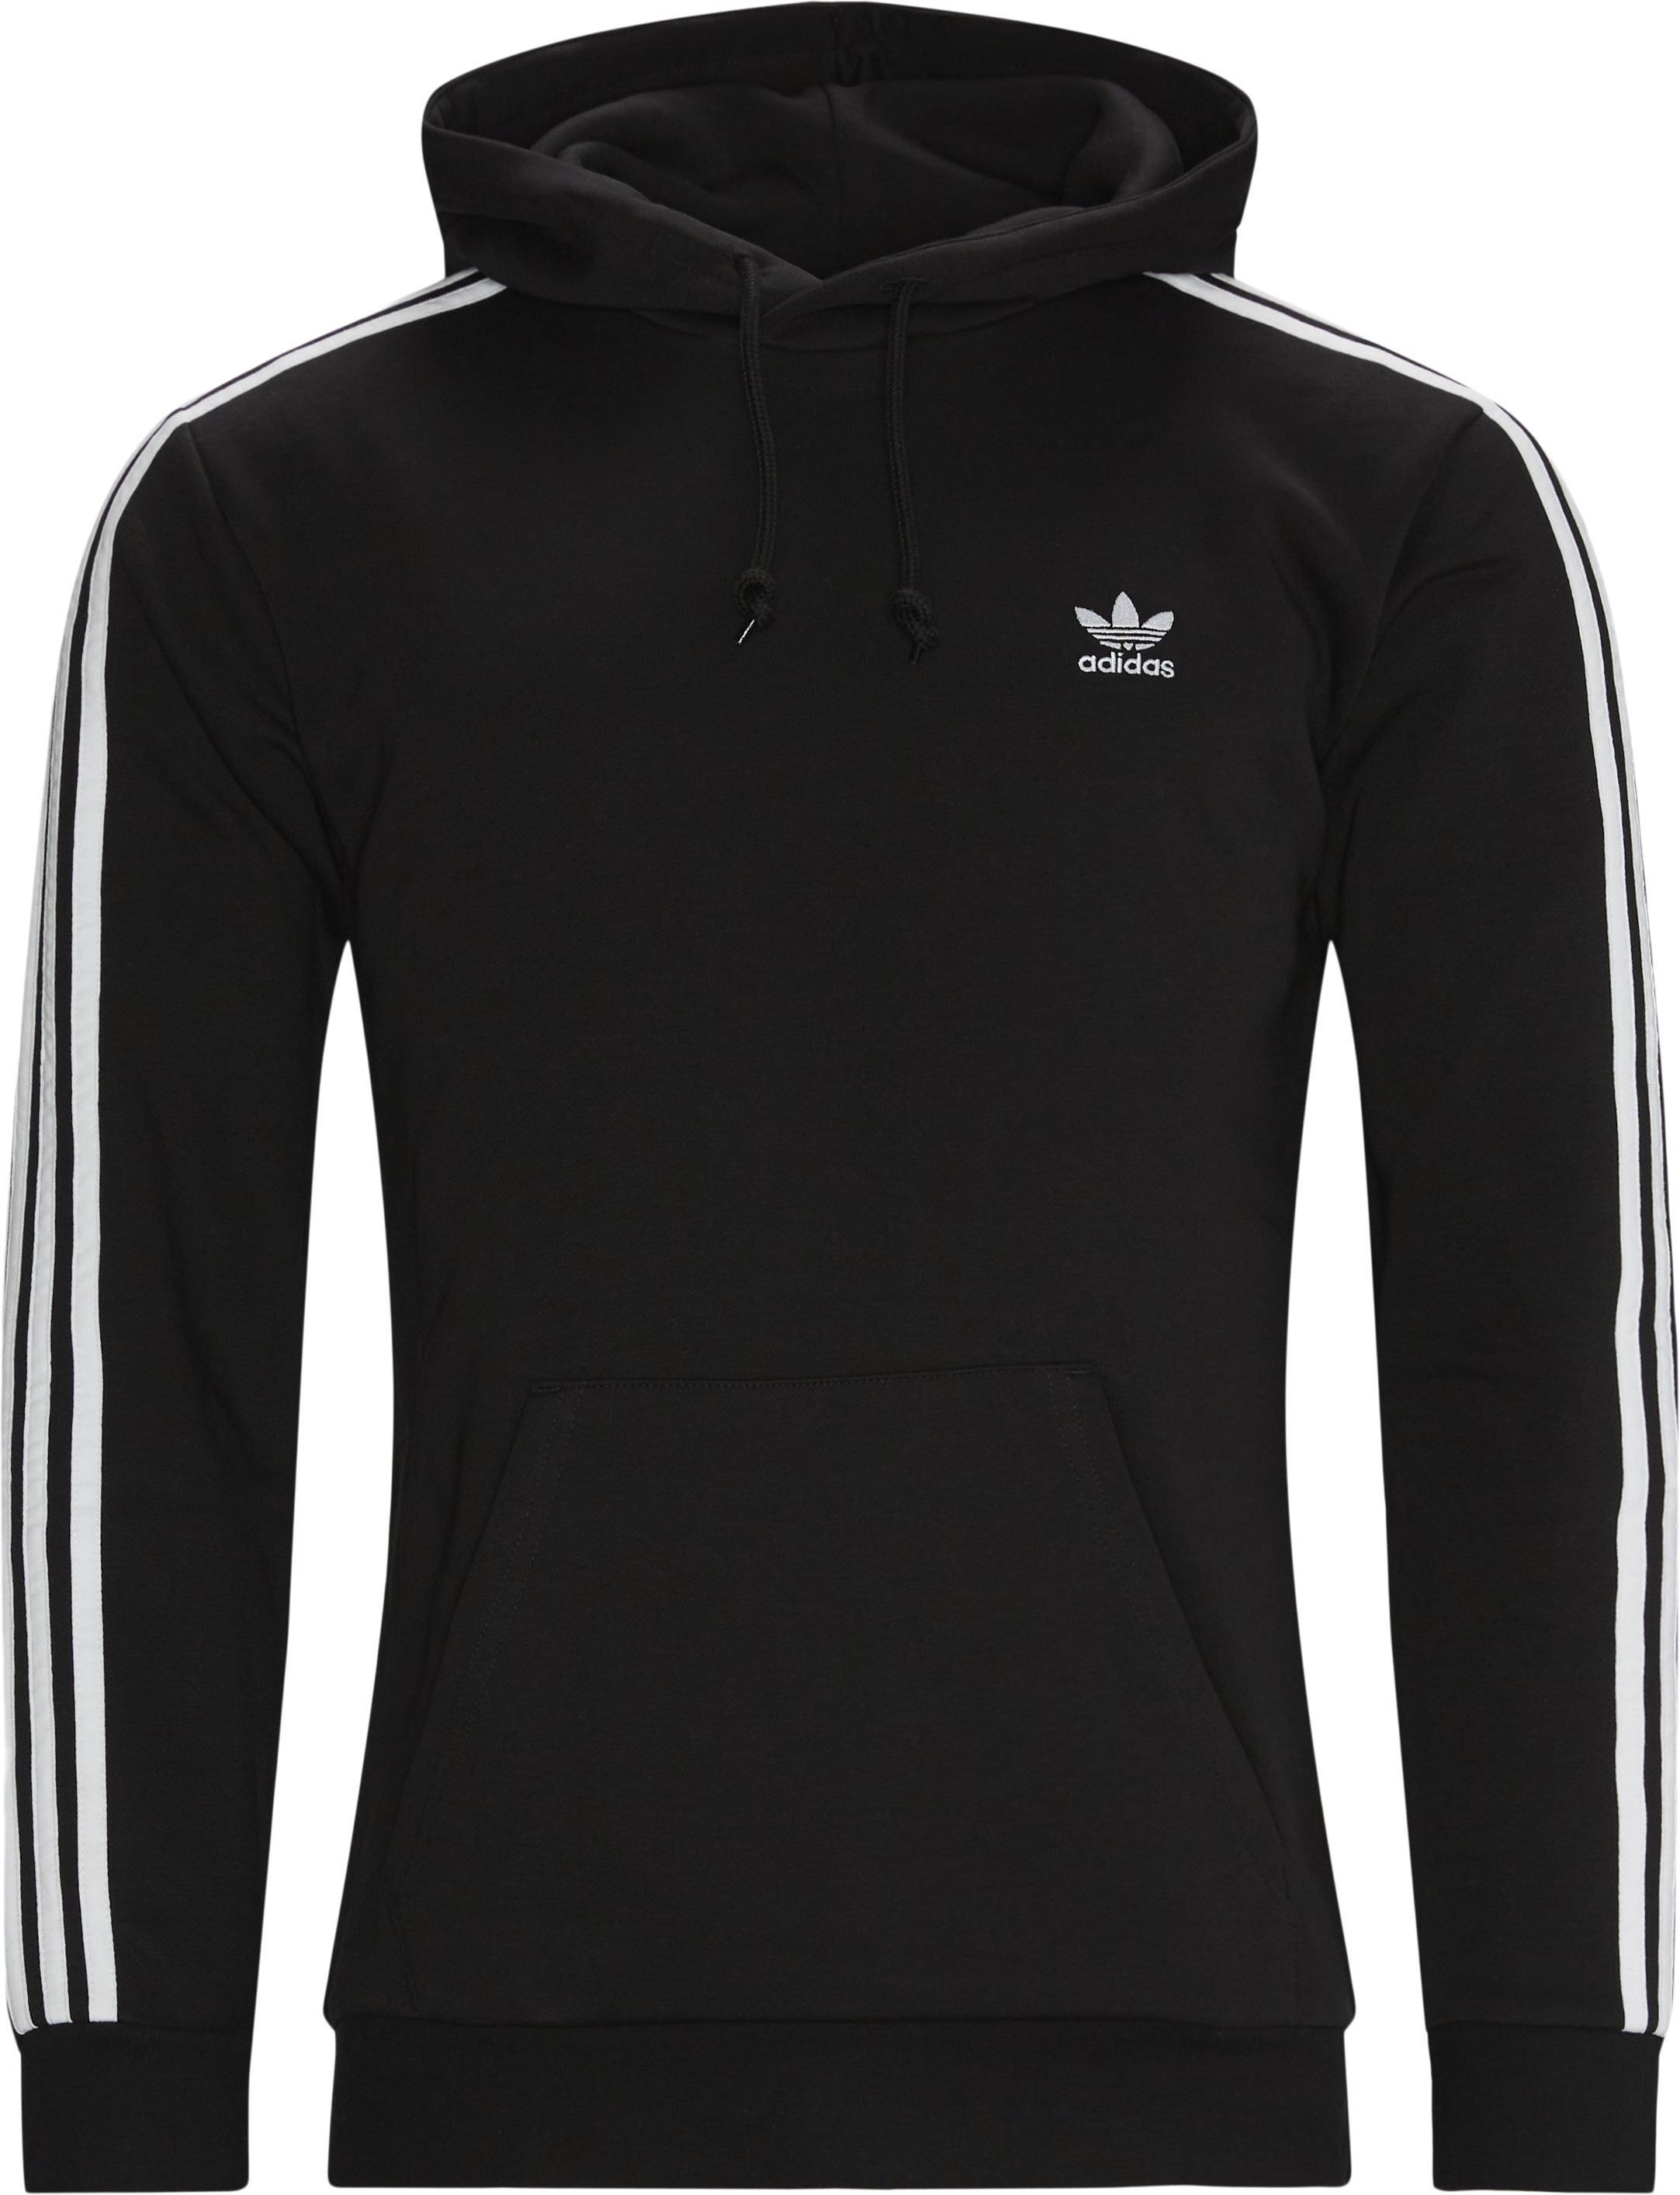 Classic 3-stripes Hoodie - Sweatshirts - Regular fit - Sort